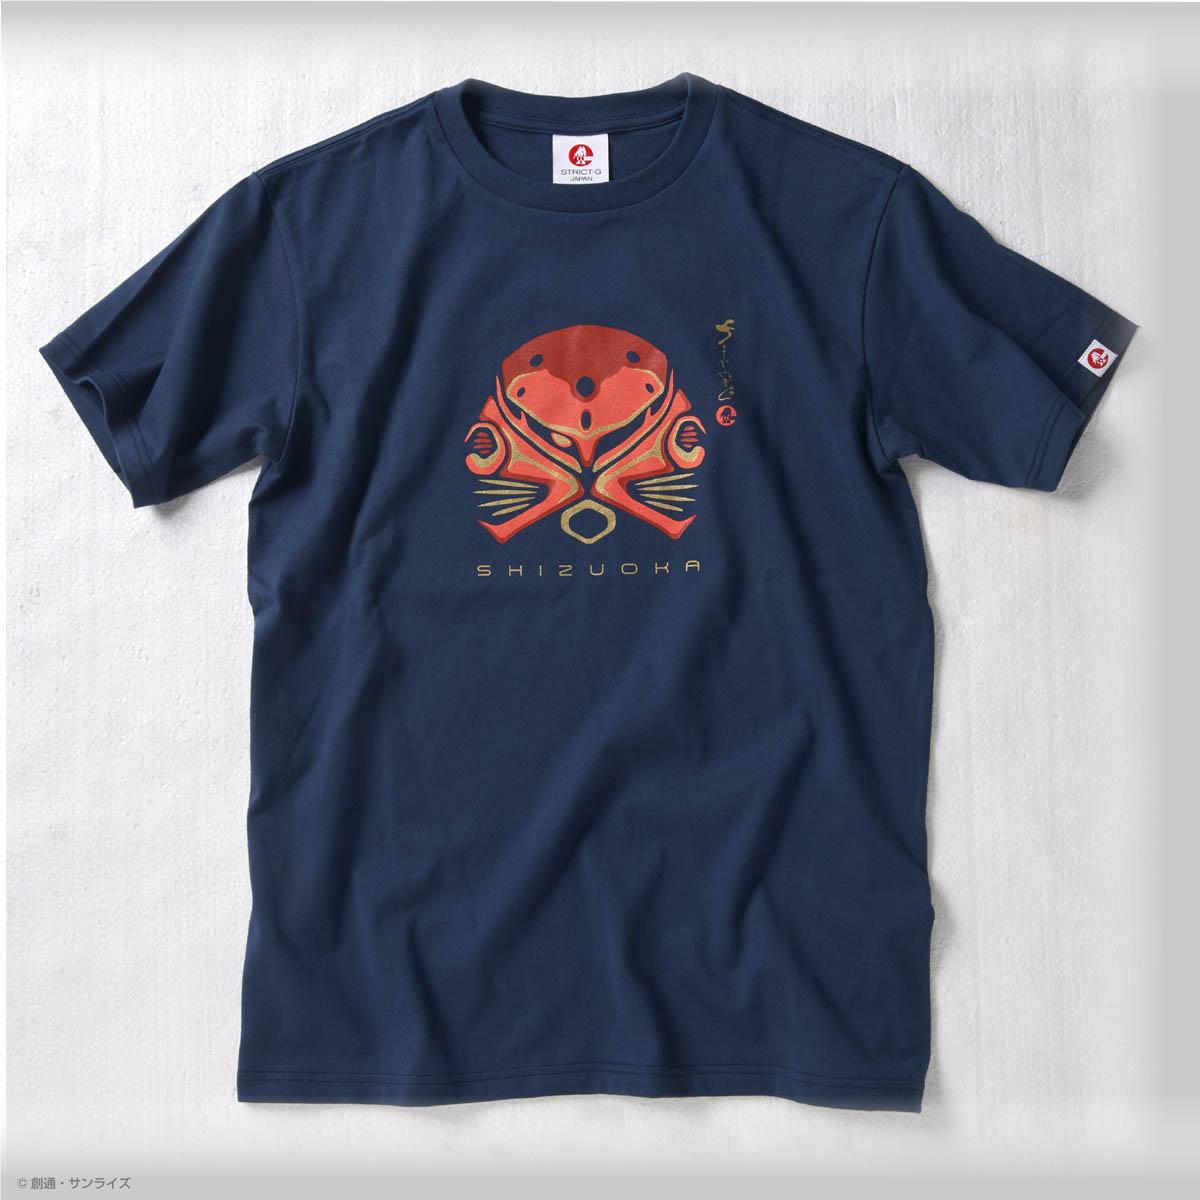 STRICT-G JAPAN 『機動戦士ガンダム』Tシャツ シャア専用ズゴック紋様柄 (STRICT-G NEOPASA静岡(下り)店限定商品)